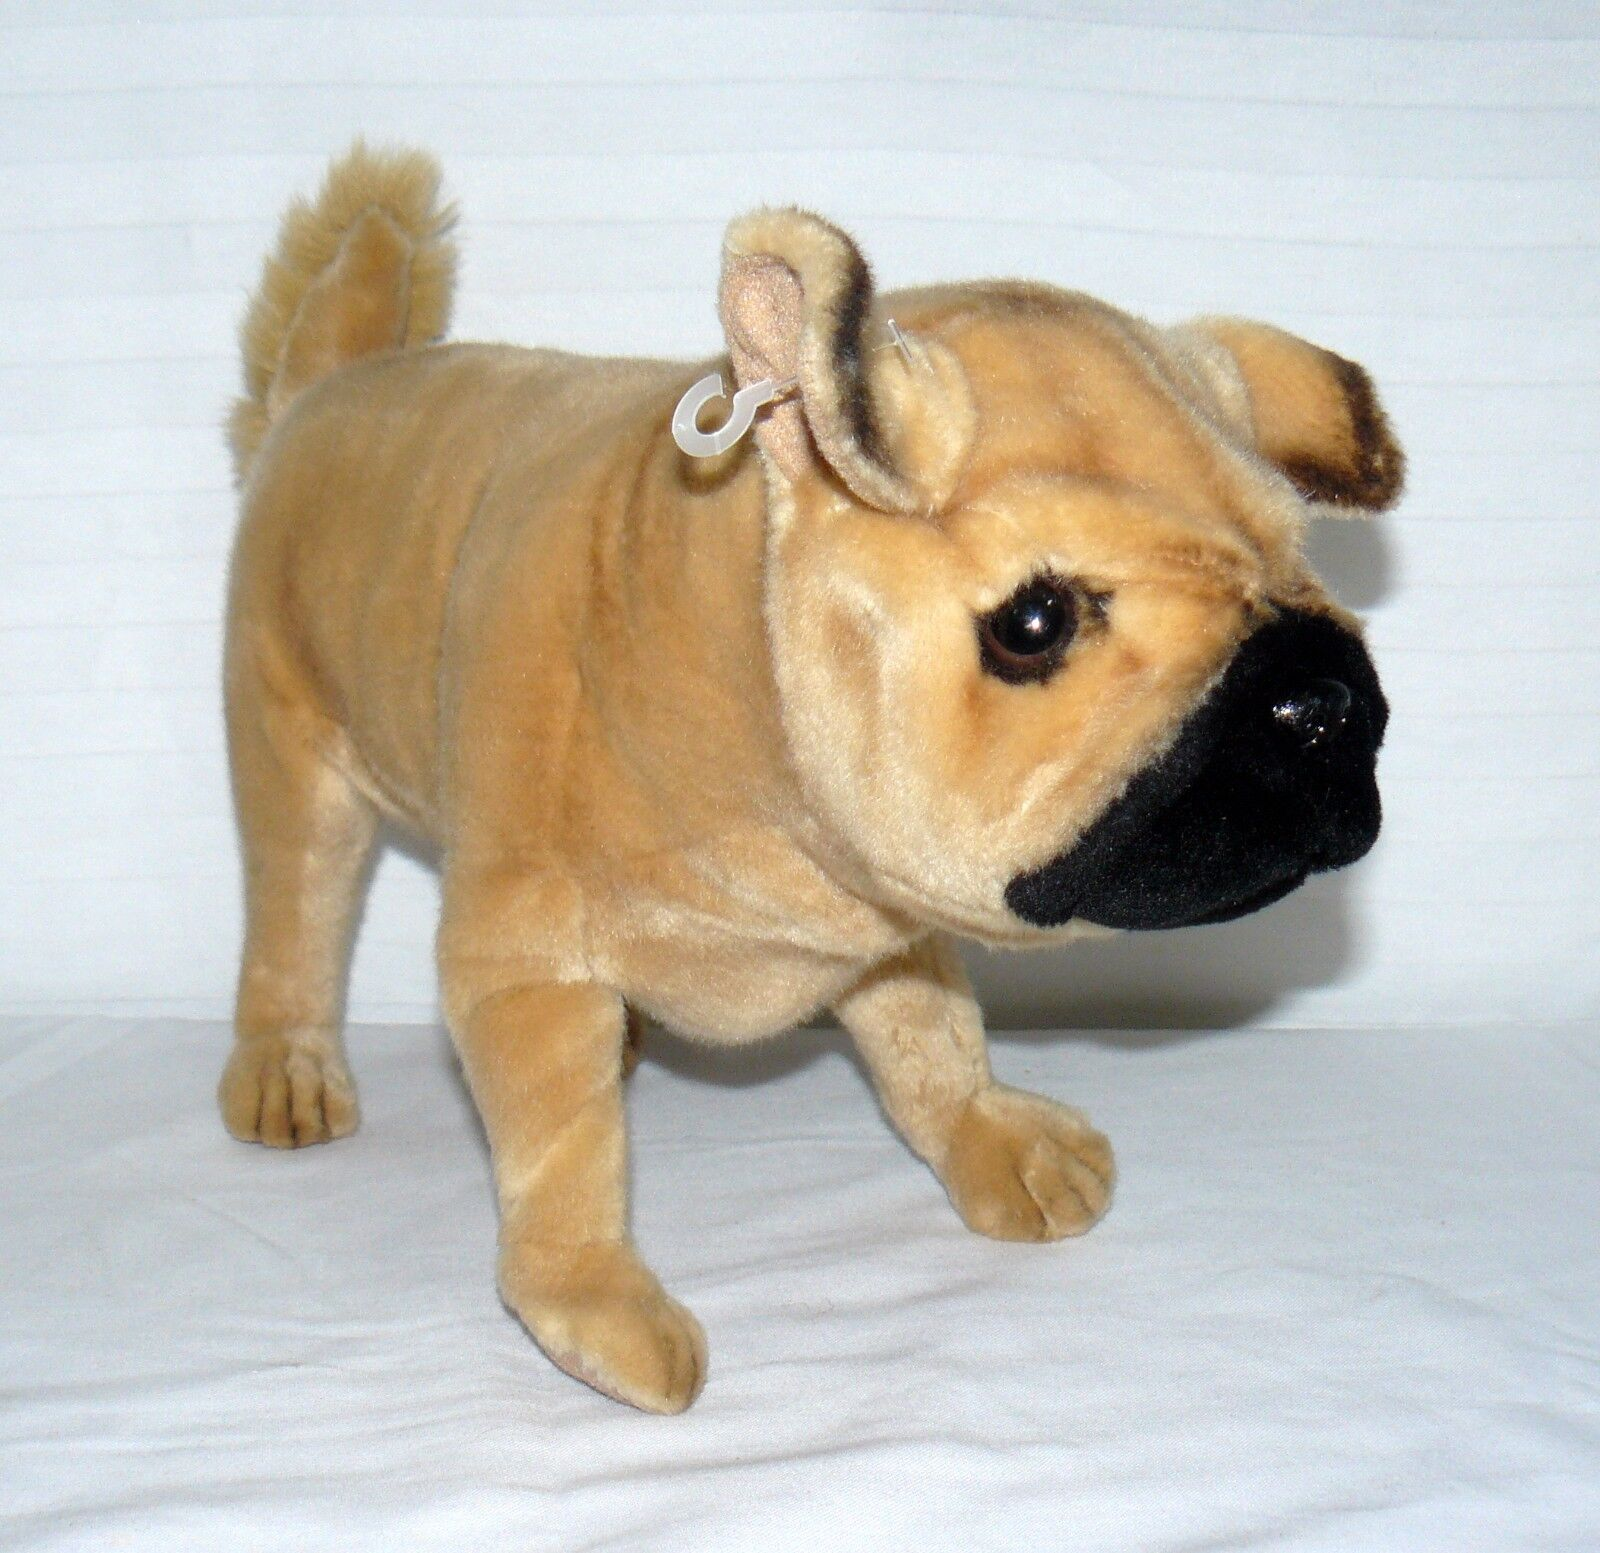 HANSA STANDING LIFE LIKE PUG PUPPY DOG PLUSH 15